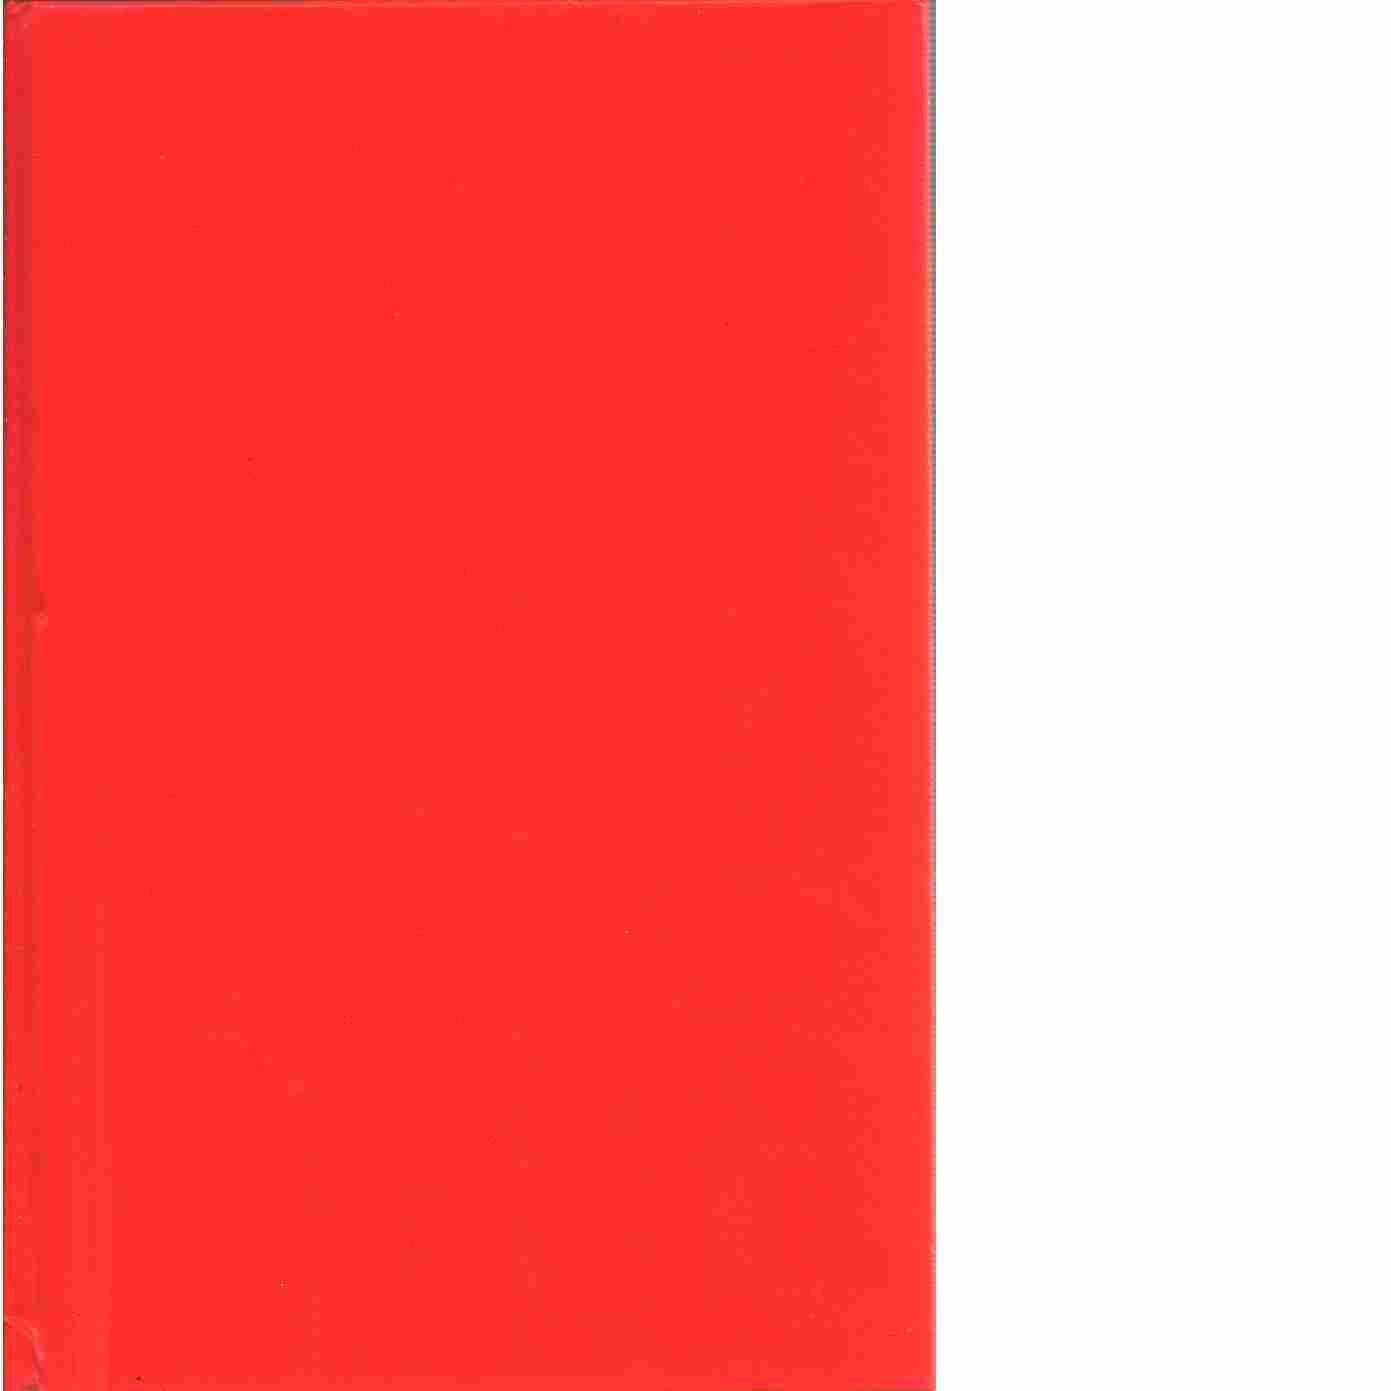 Röda rummet - Strindberg, August